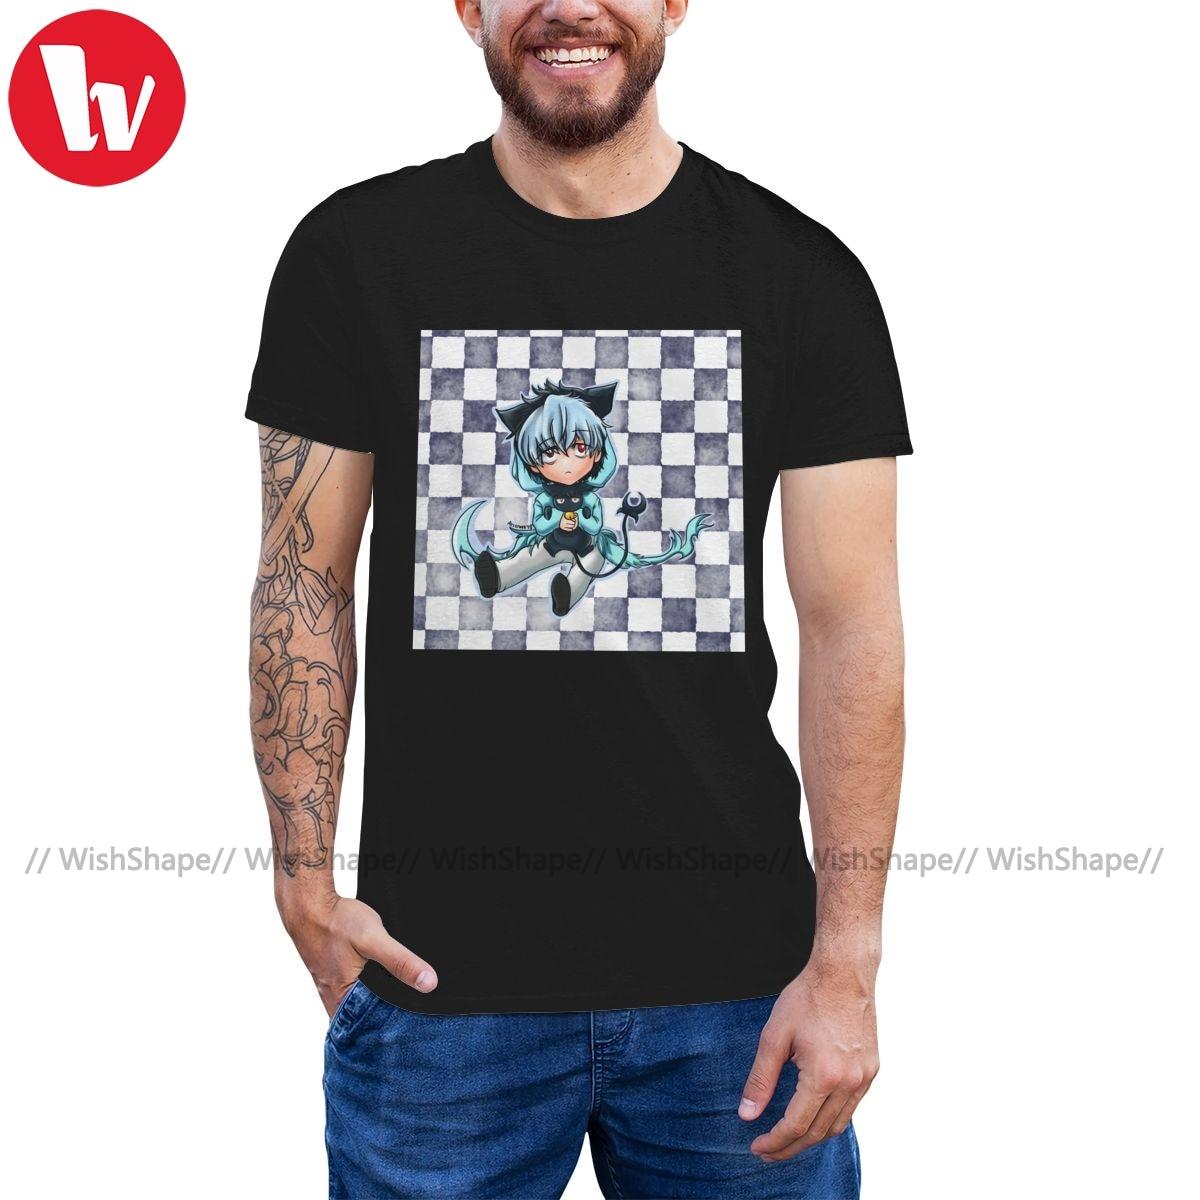 Servamp T camisa Chibi sueño camiseta color ceniza de los hombres impresa Camiseta de manga corta 100 algodón impresionante camiseta